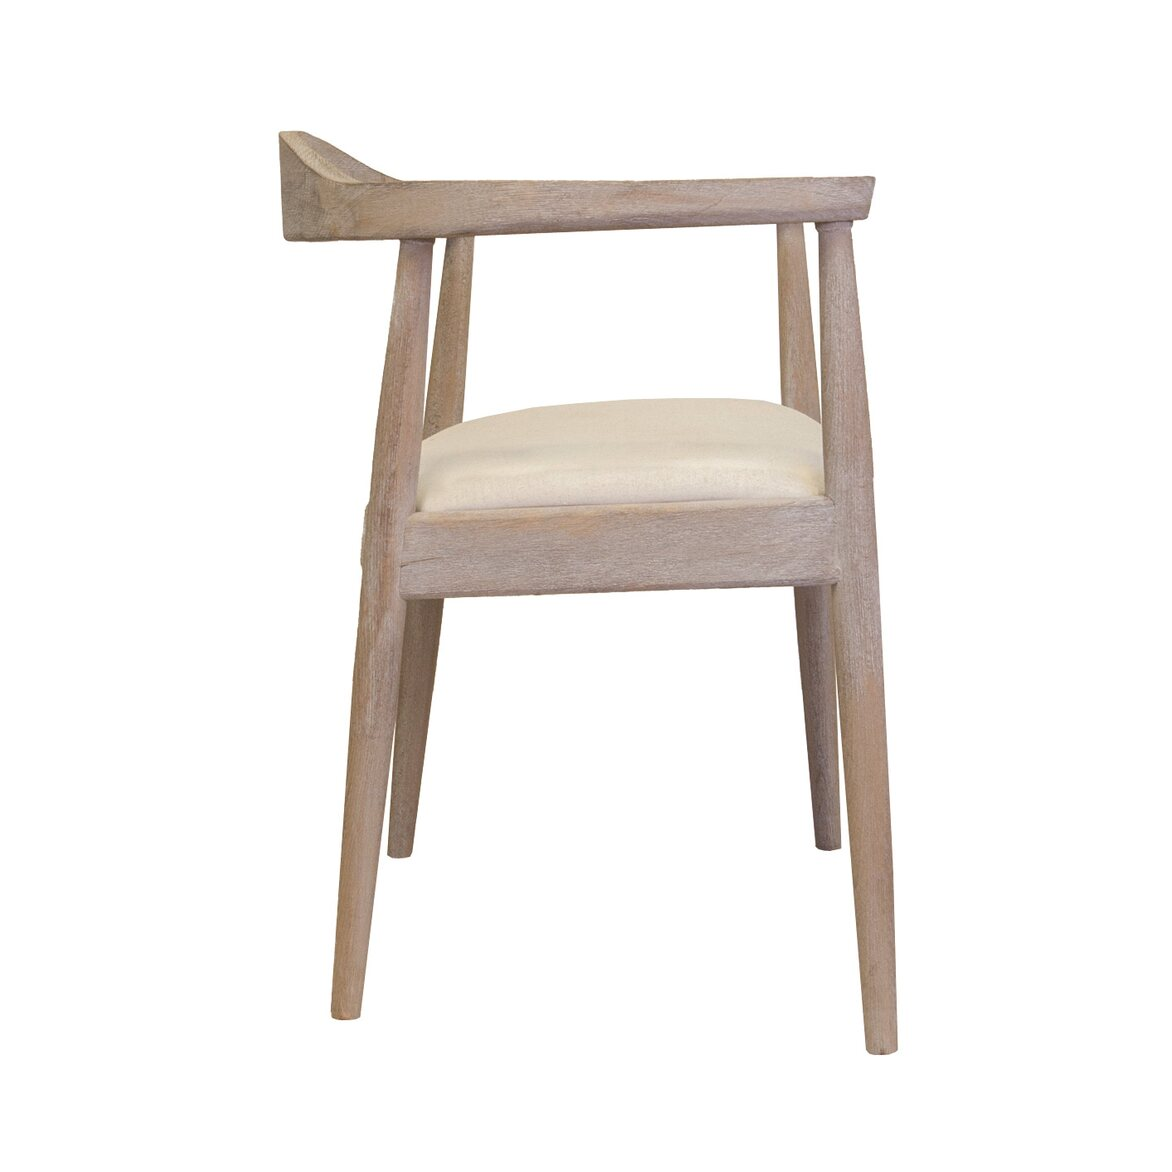 Стул Carlo old 2 | Обеденные стулья Kingsby